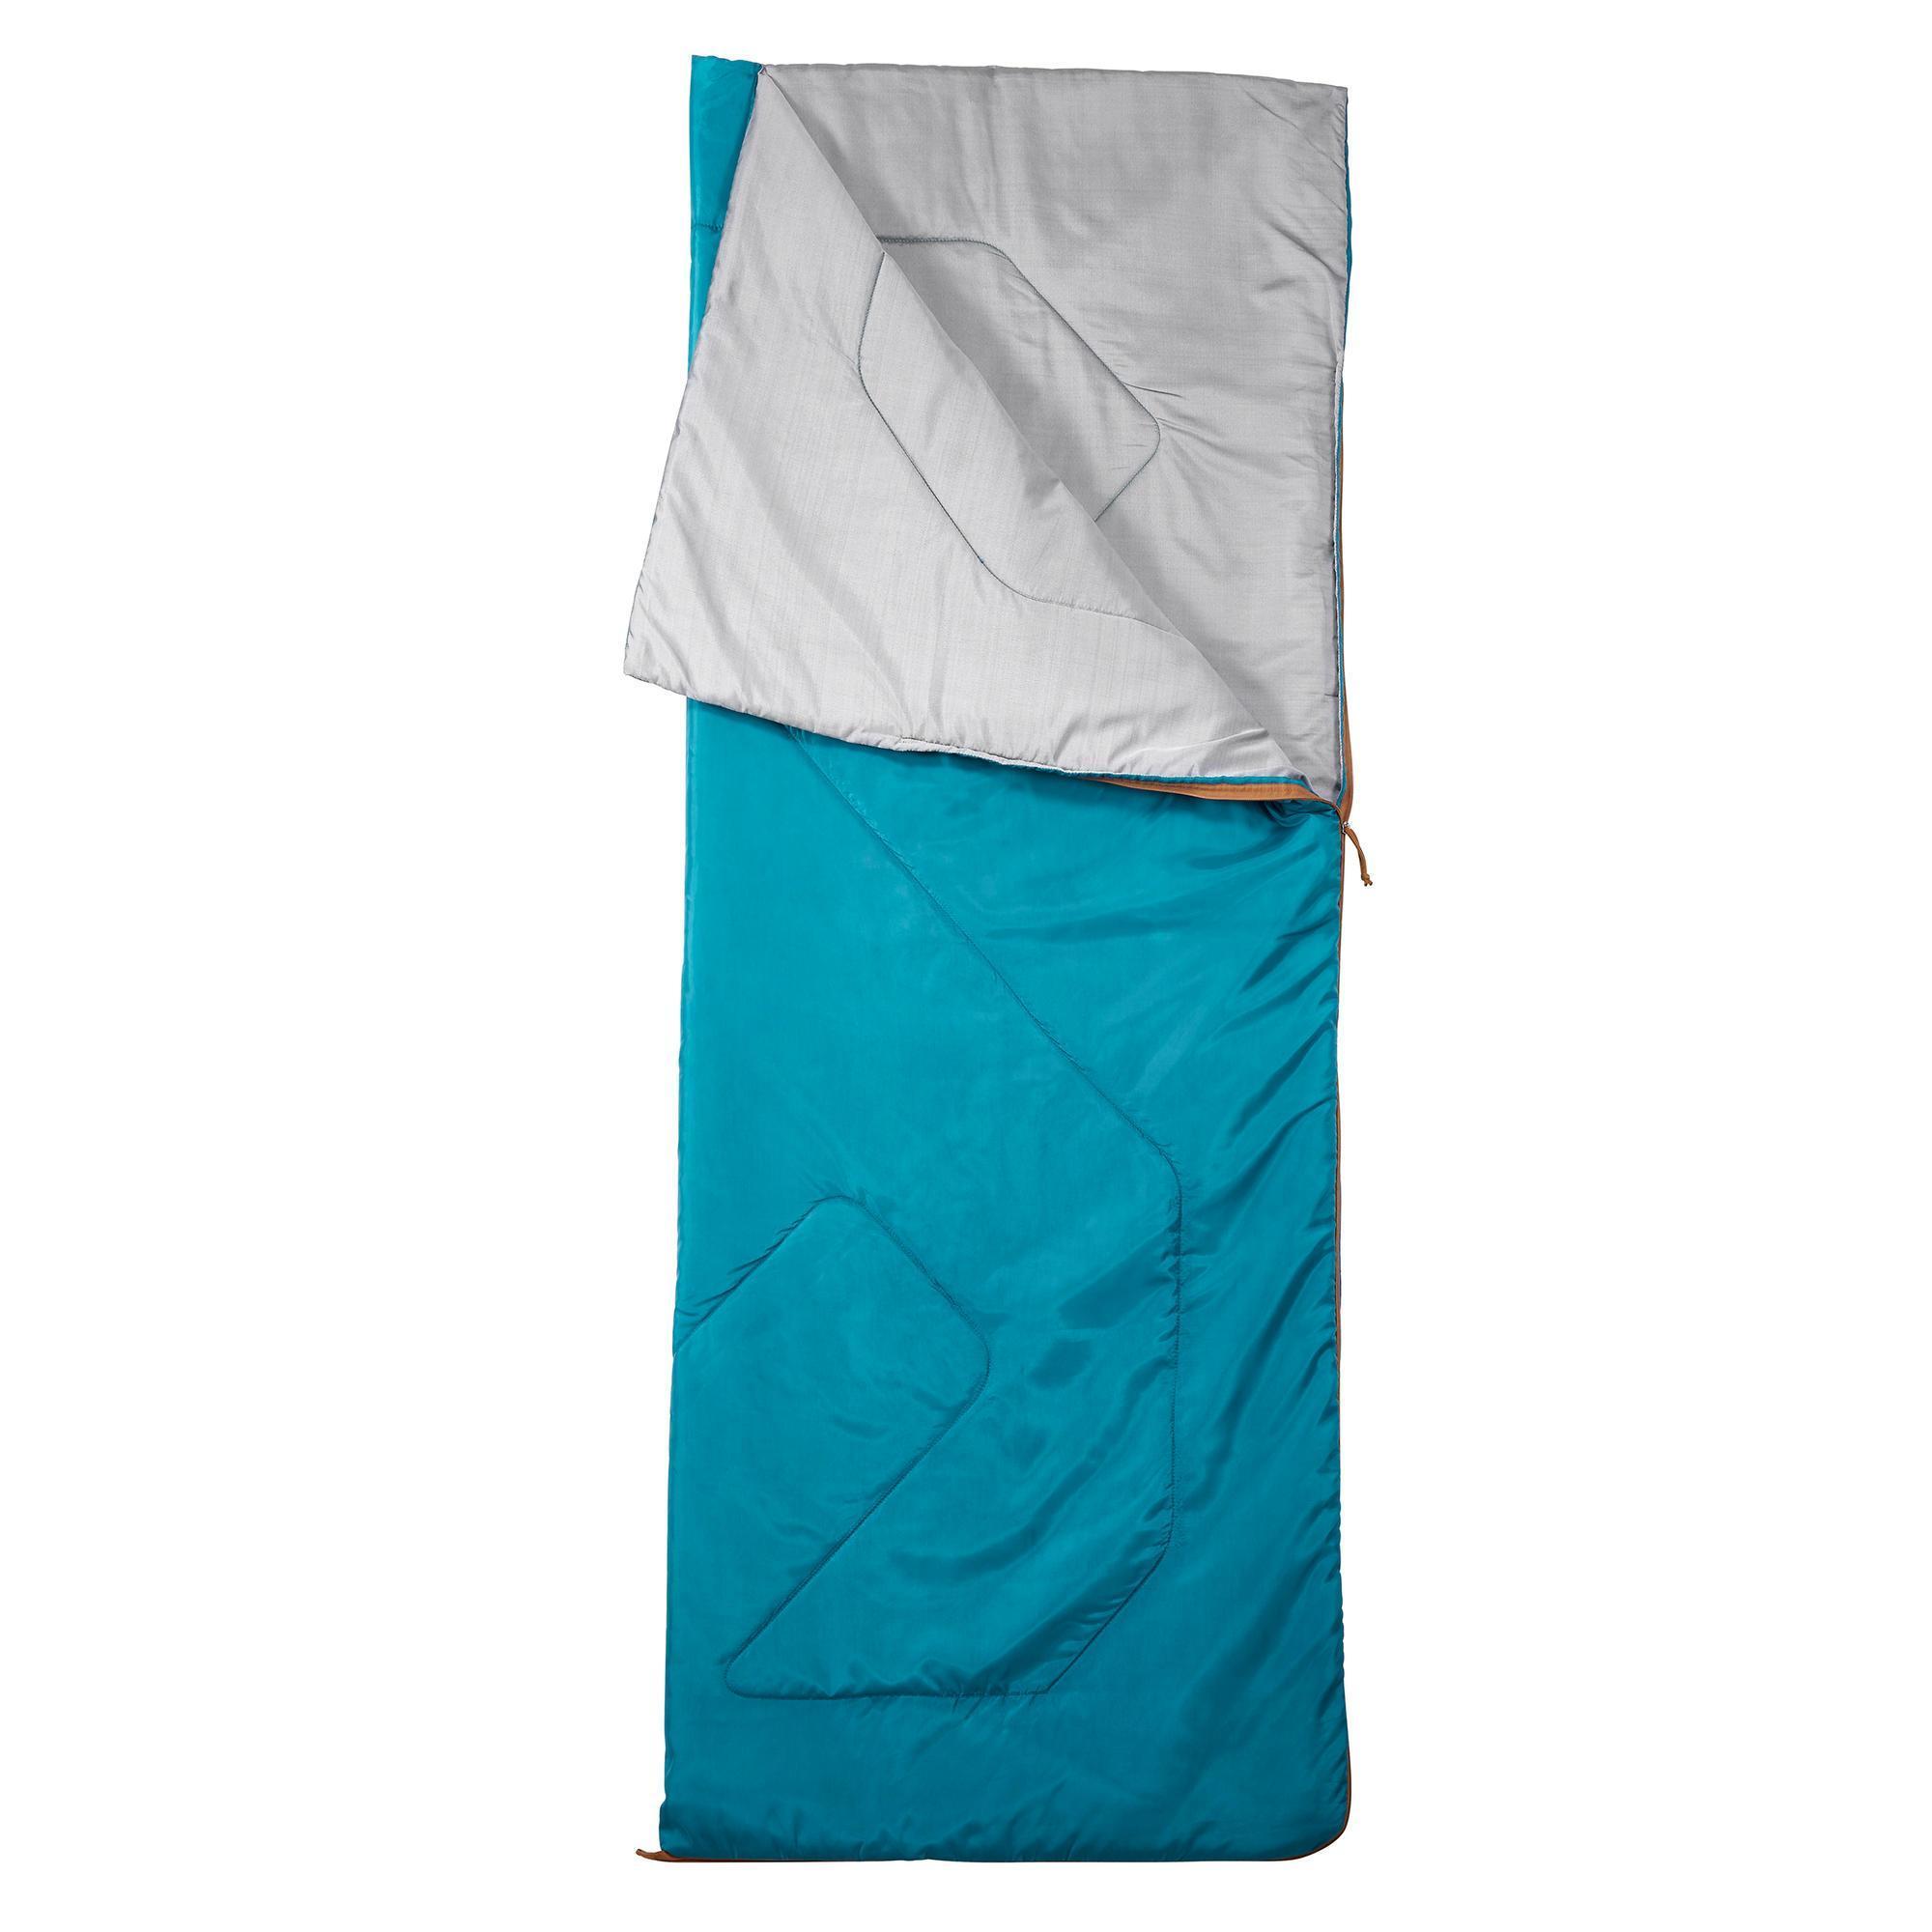 Schlafsack Camping Arpenaz 20°C blau